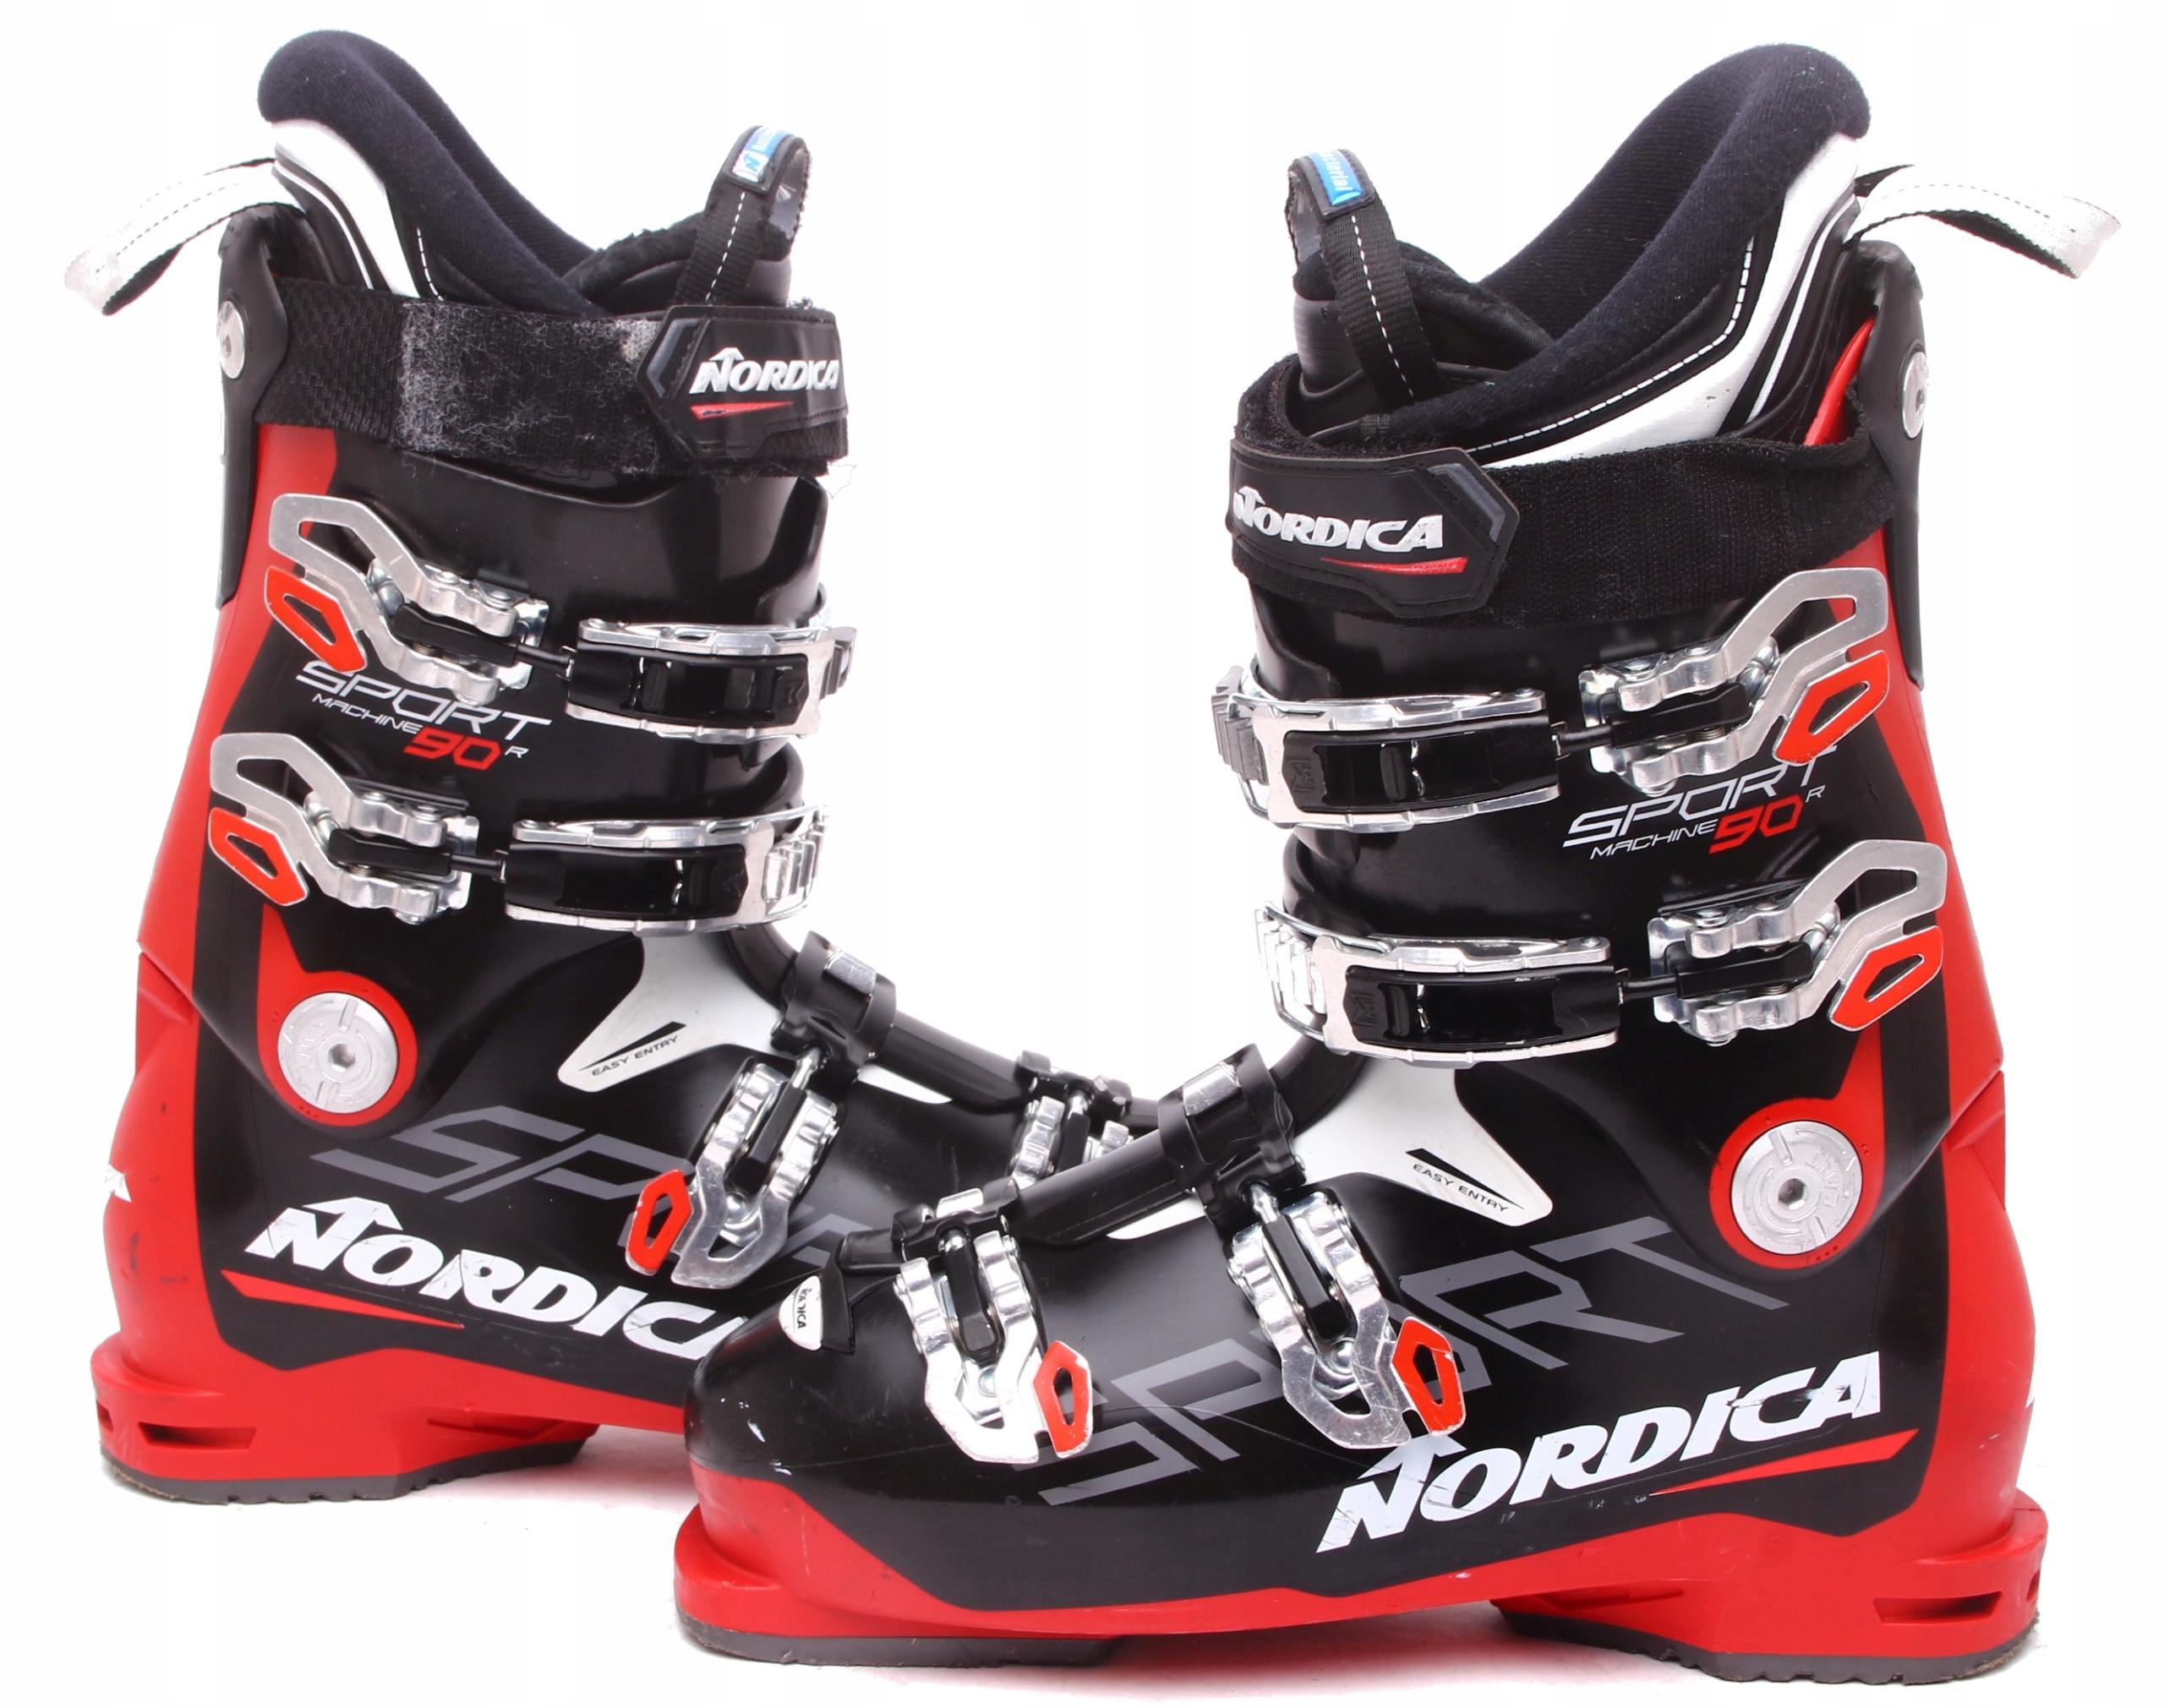 Buty Narciarskie Nordica Sportmachine 90 27 Cm 9675159033 Allegro Pl